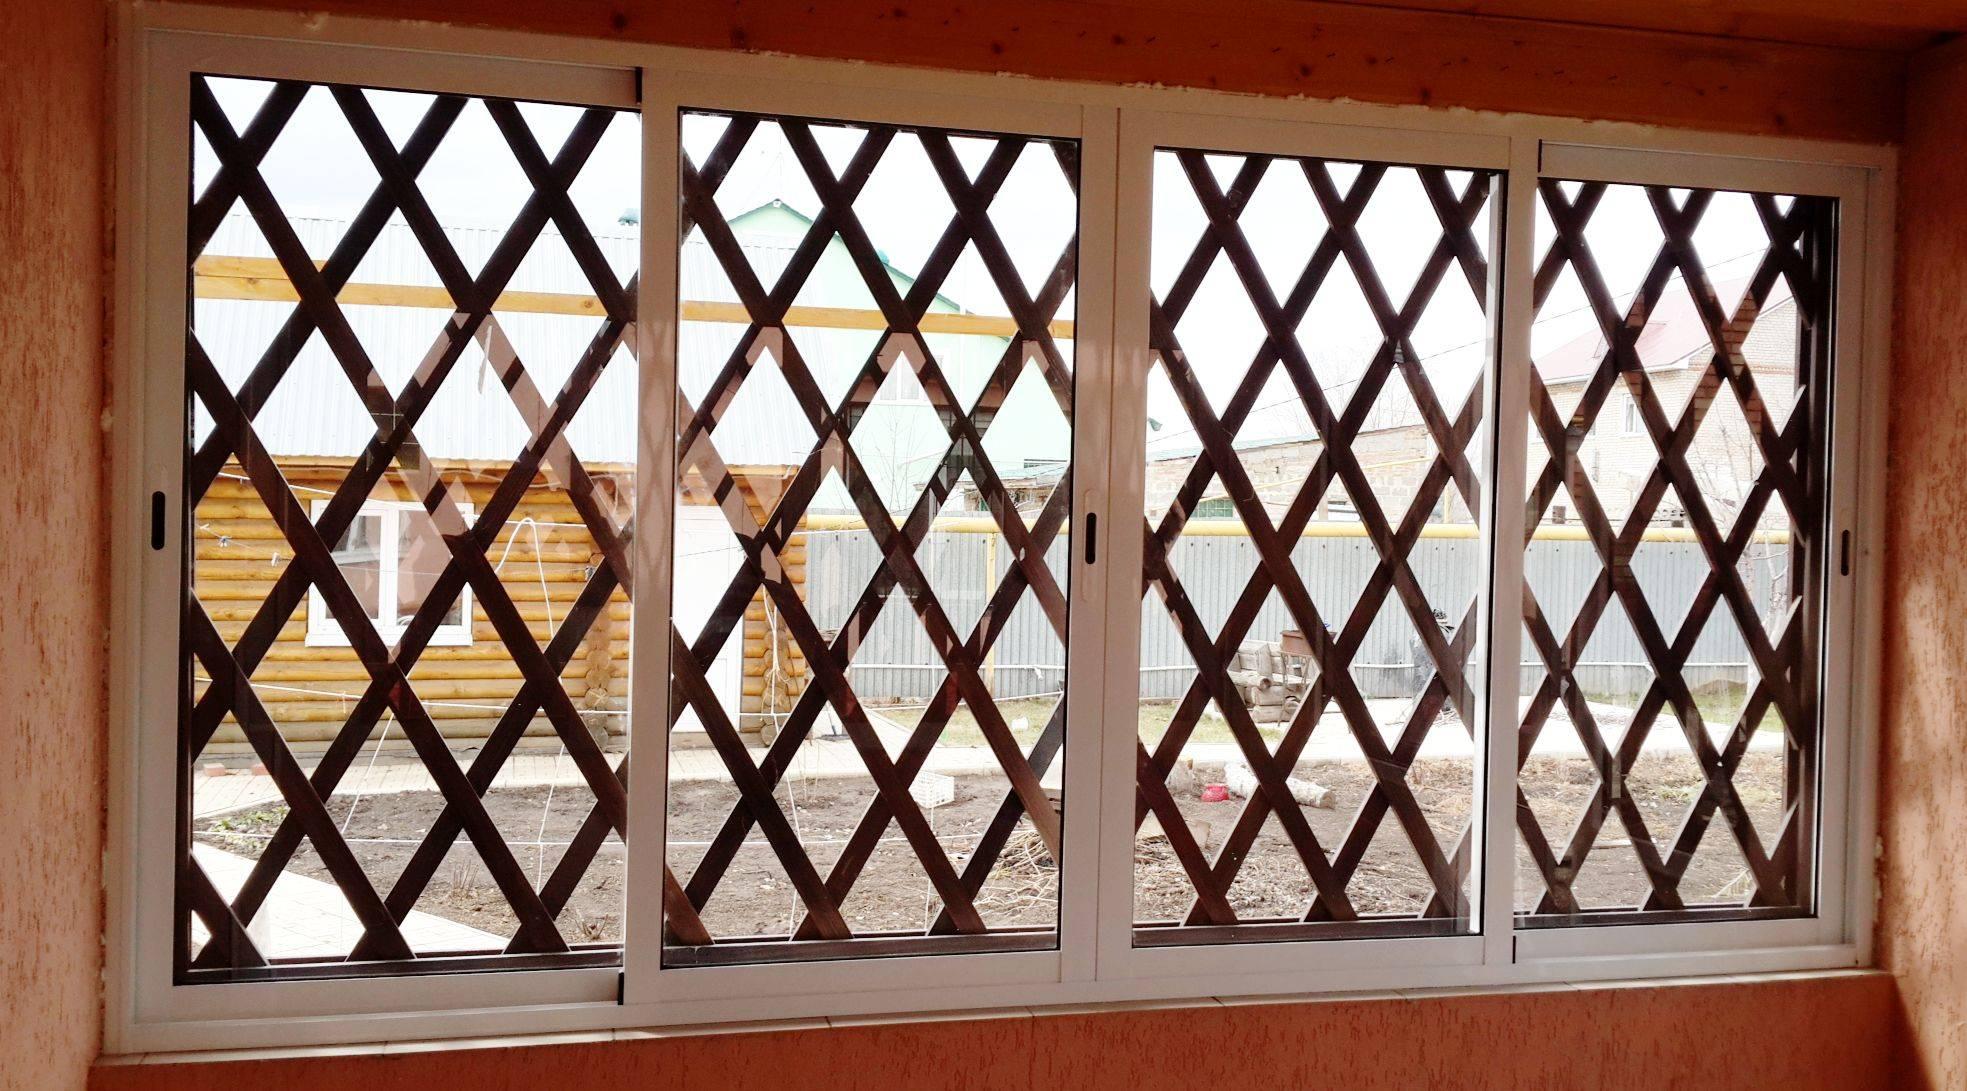 Ставни на окна: разнообразие видов и идеи оформления